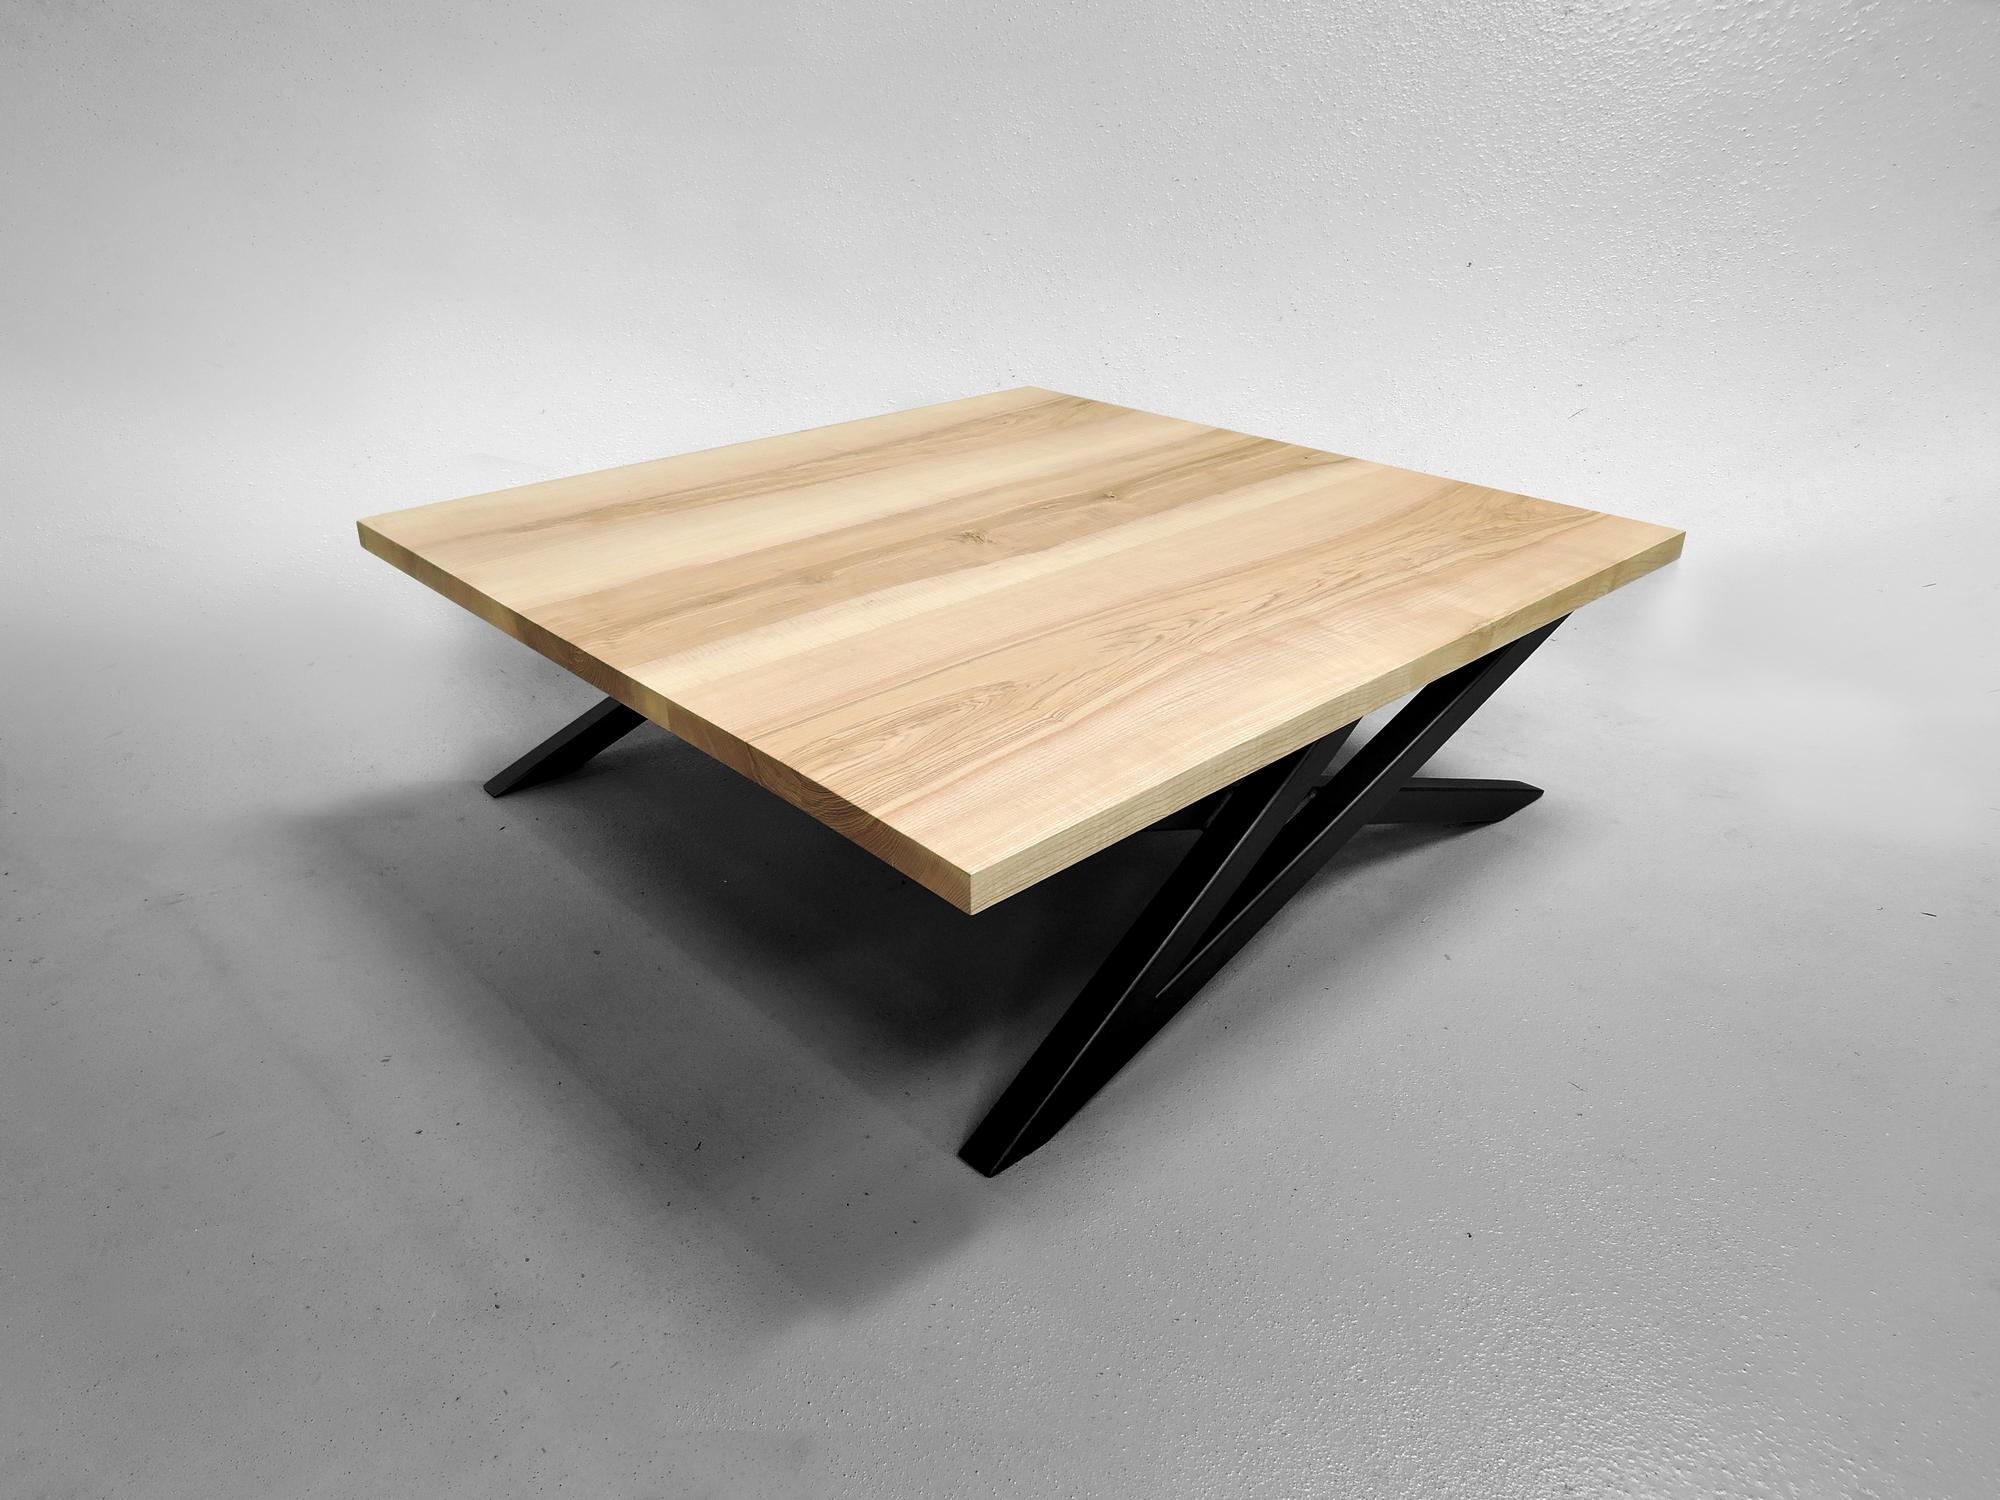 table basse signature acier et bois massif fabrication. Black Bedroom Furniture Sets. Home Design Ideas